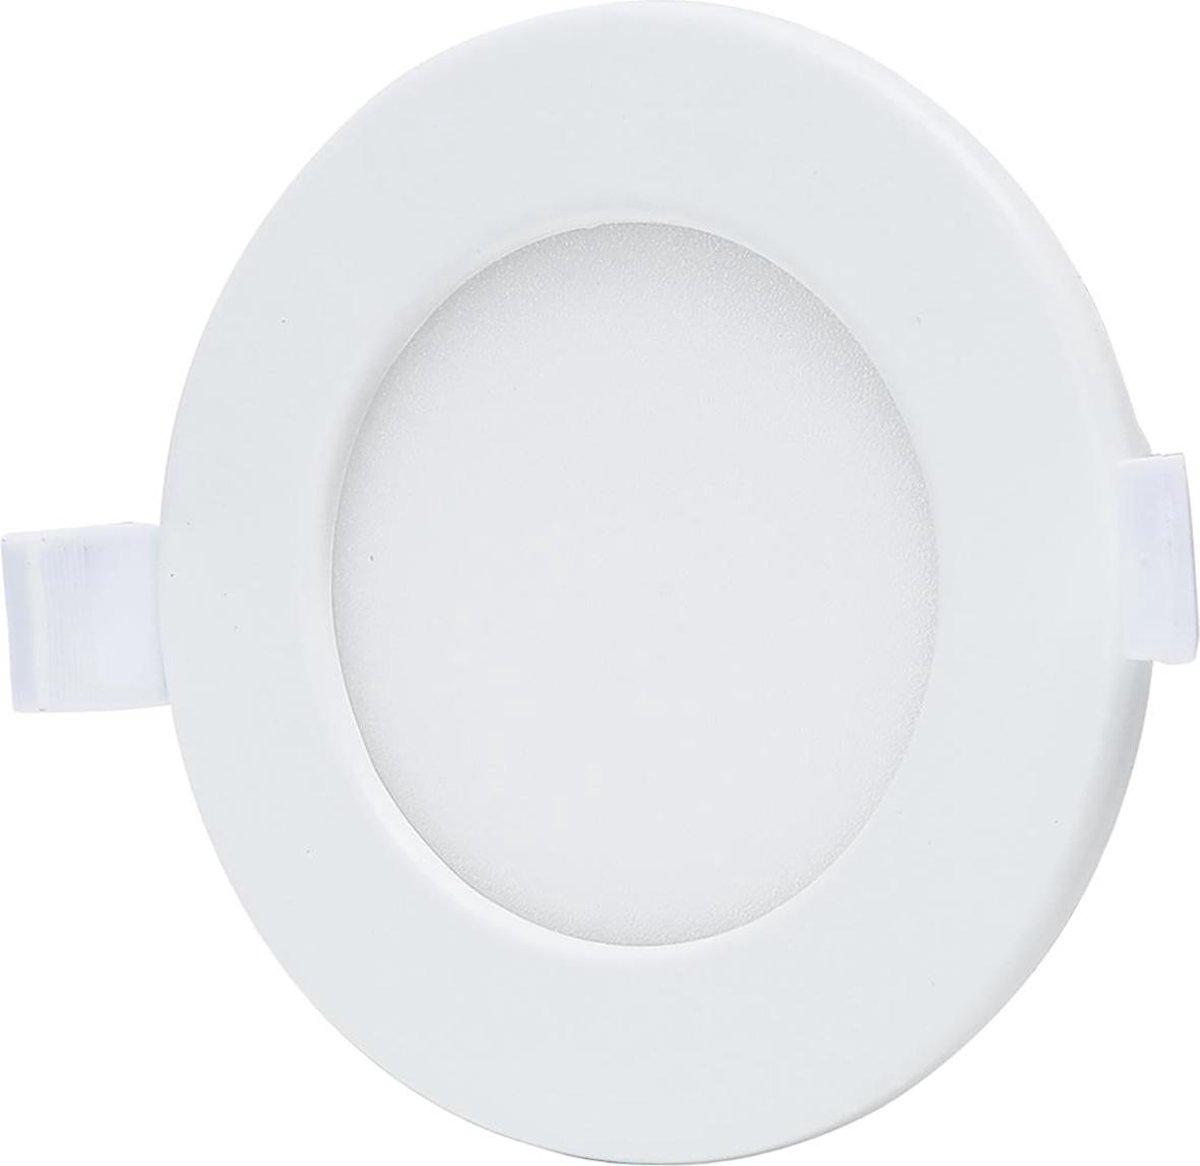 LED Downlight - Smart LED - Igory Zumba - 6W - Aanpasbare Kleur - Inbouw Rond - Mat Wit - Aluminium - Ø105mm